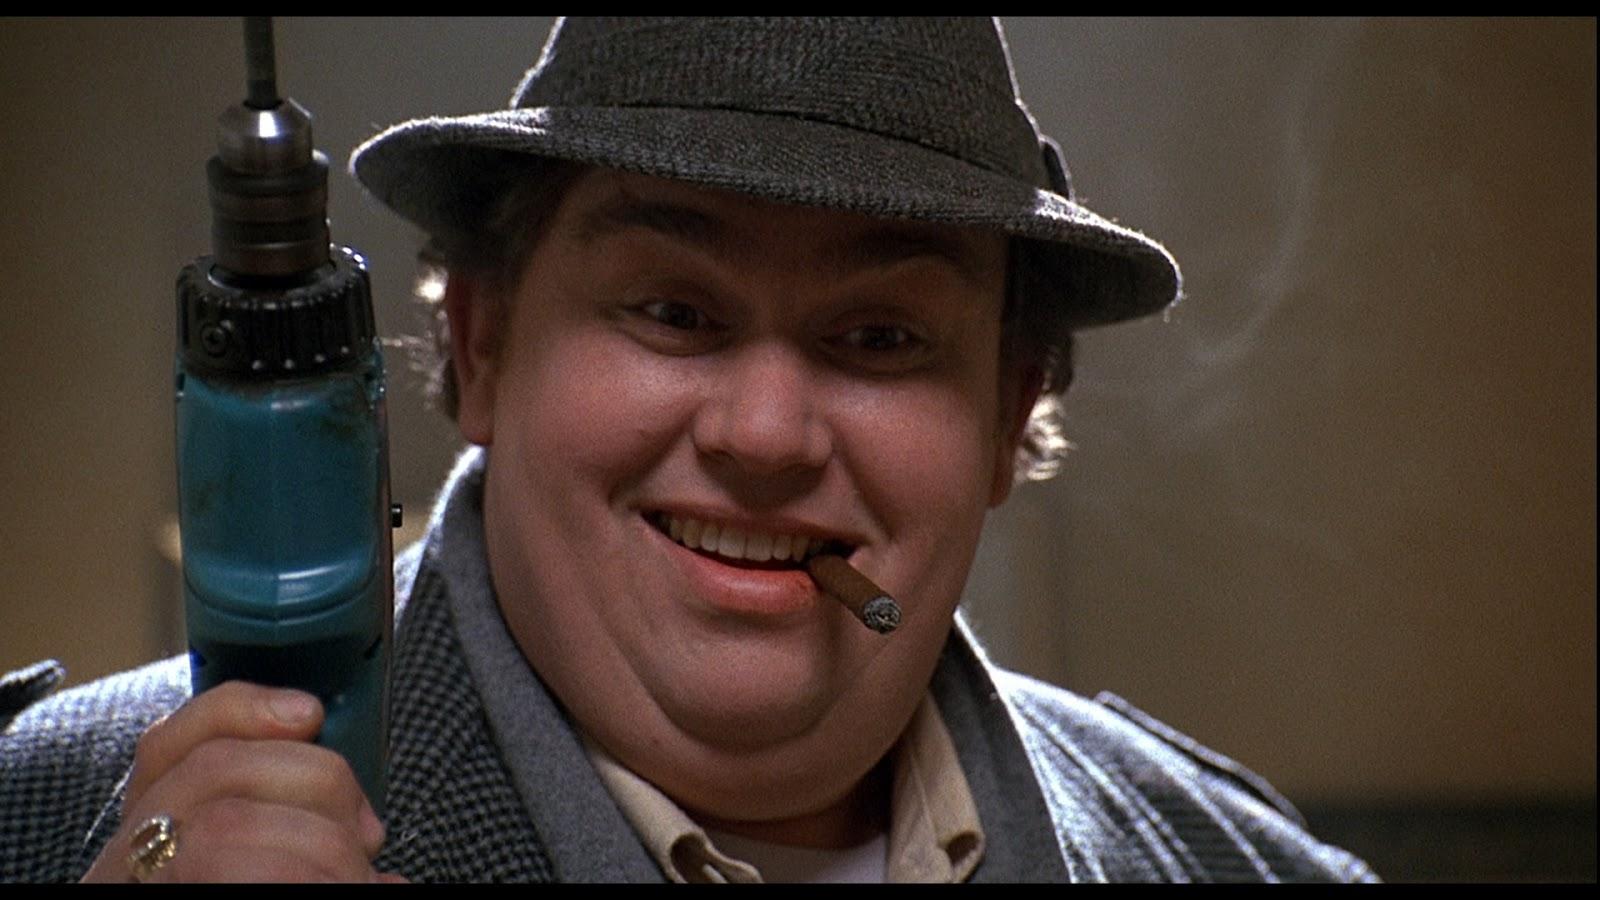 uncle buck john hughes 1989 weak john hughes comedy about